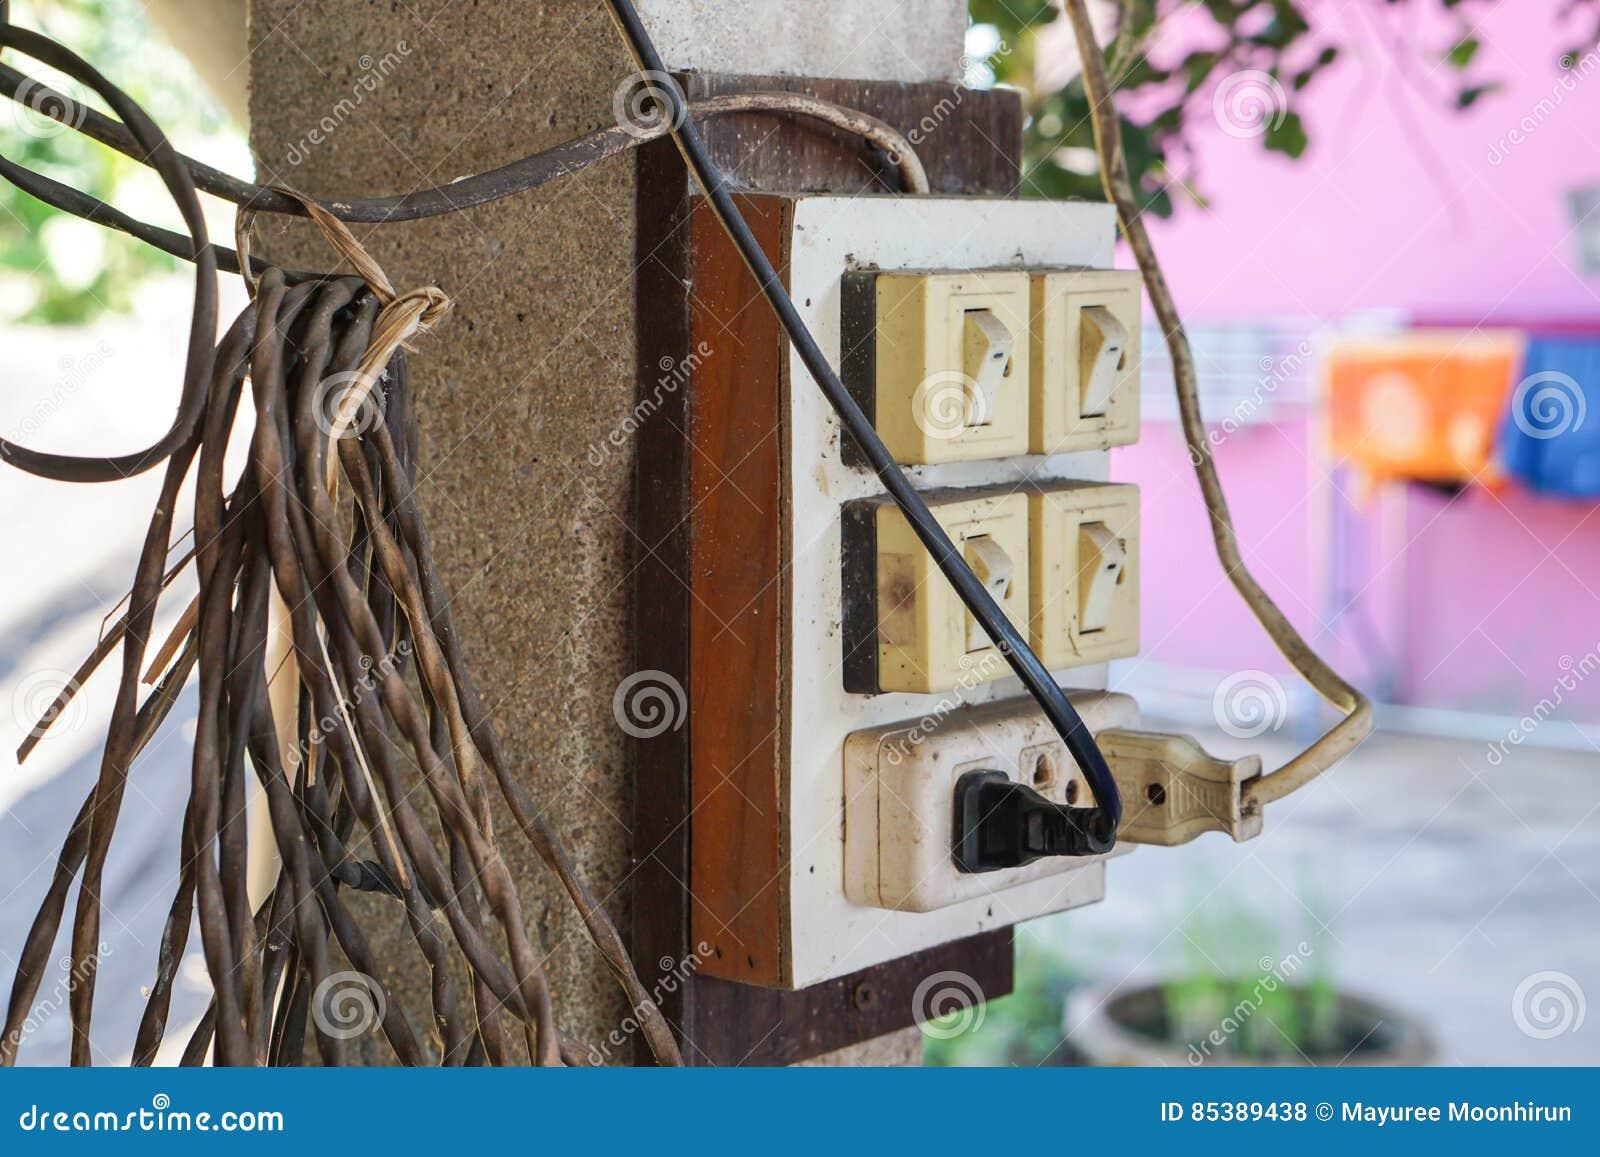 Wiring Up Plug Socket